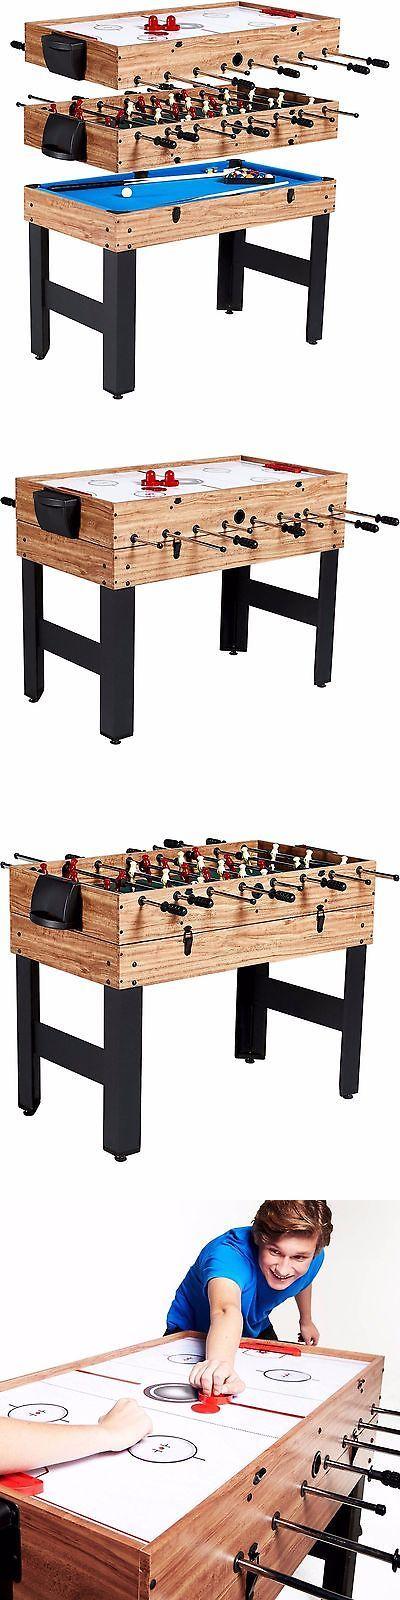 Foosball 36276: Multi Game Table Combo 3 In 1 Pool Billiards Air Hockey Foosball Soccer Convert BUY IT NOW ONLY: $103.95